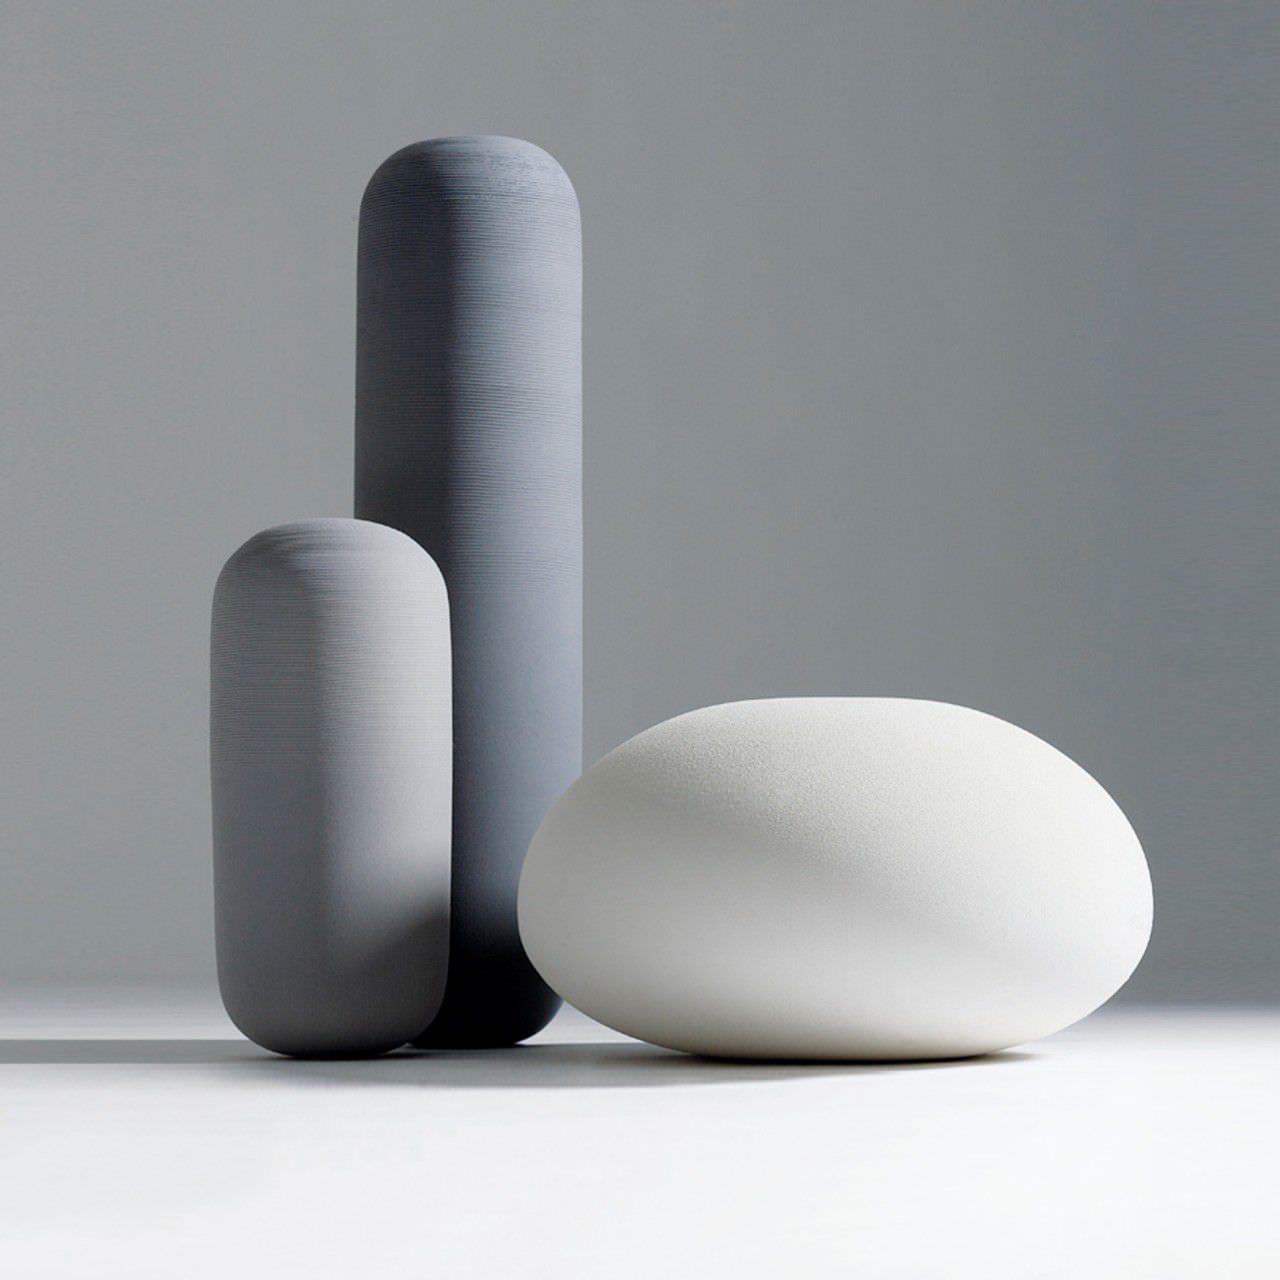 stunning vase ceramique design contemporary joshkrajcik. Black Bedroom Furniture Sets. Home Design Ideas